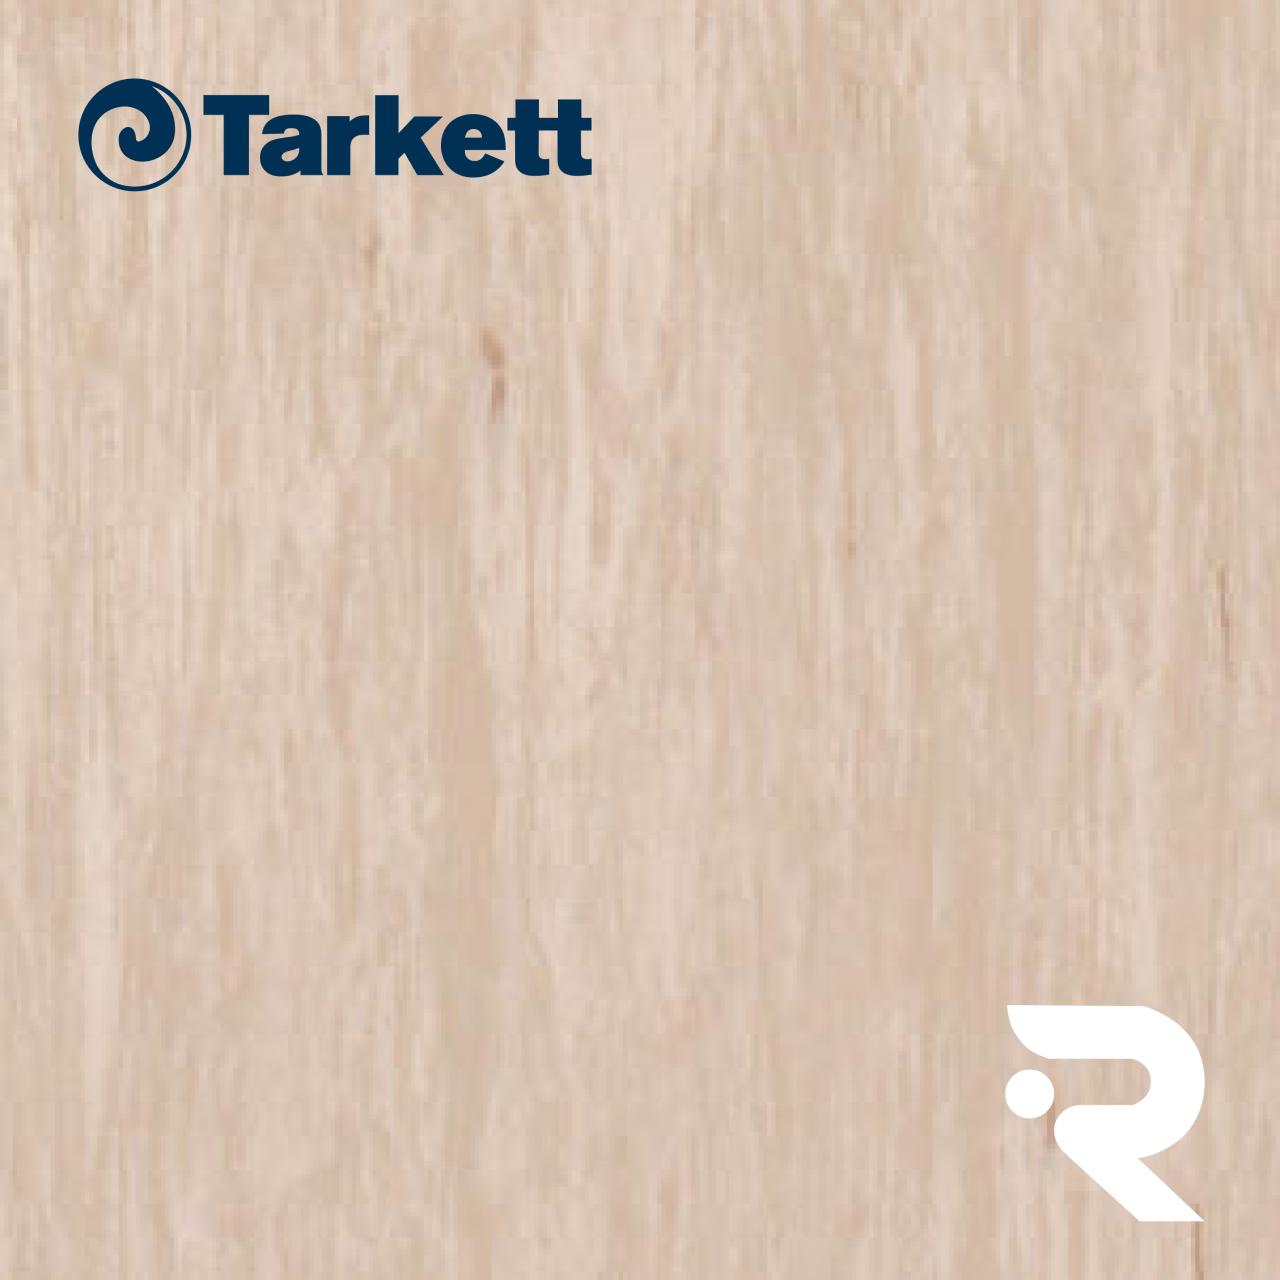 🏫 Гомогенный линолеум Tarkett   Standard LIGHT BEIGE 0479   Standard Plus 2.0 mm   2 х 23 м